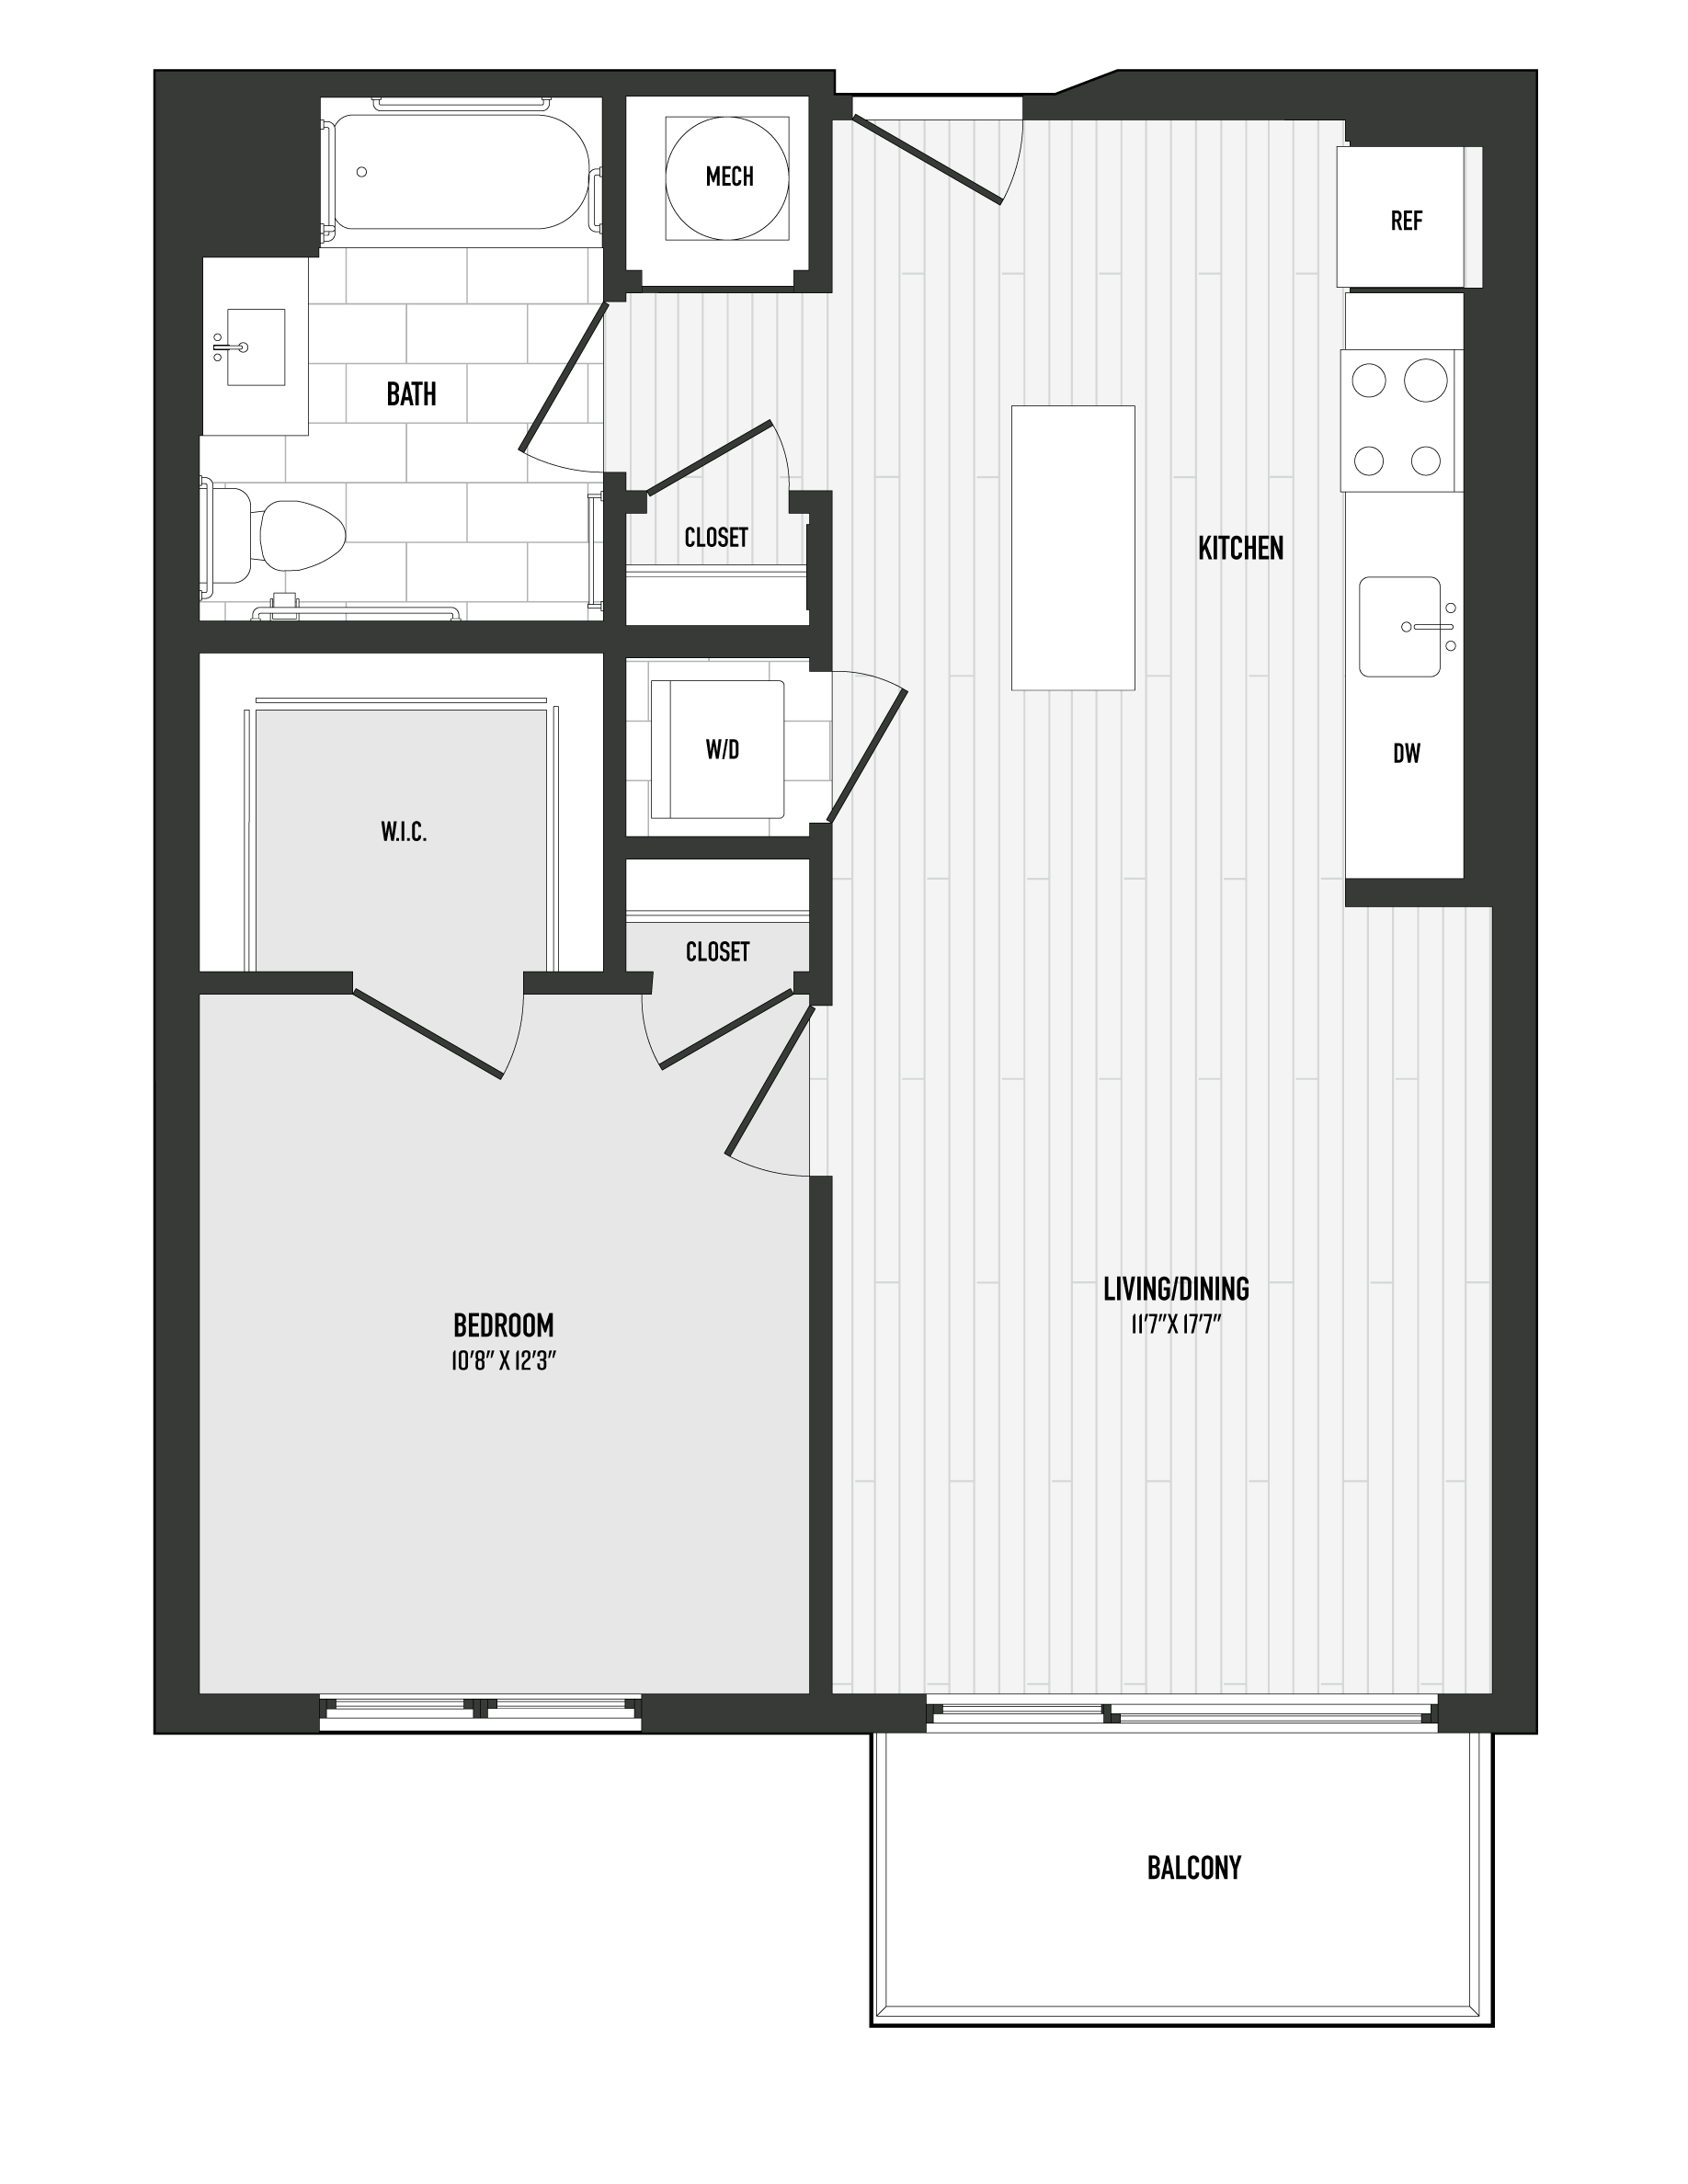 APT. 605 floor plan thumb